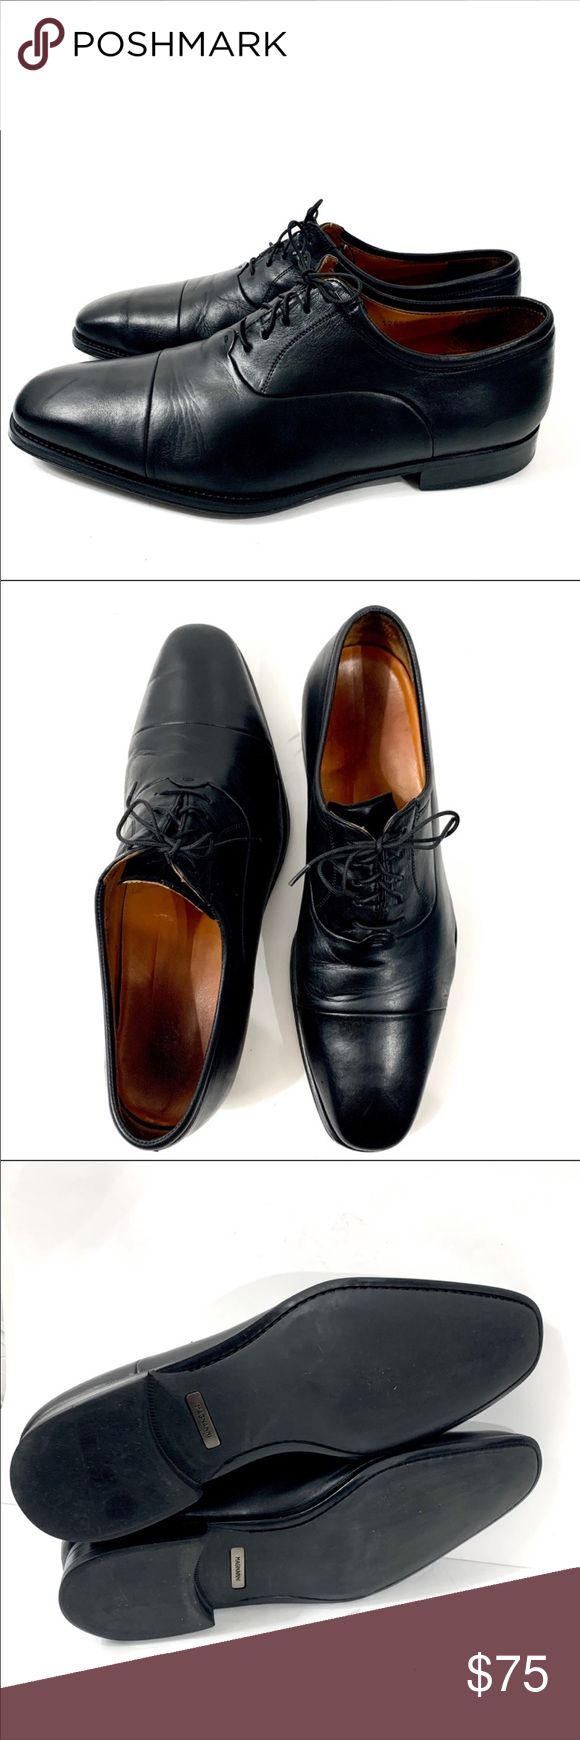 Classic Black Dress Shoe H M Men S Classics Mens Black Dress Shoes Sneaker Dress Shoes Black Dress Shoe [ 1137 x 972 Pixel ]